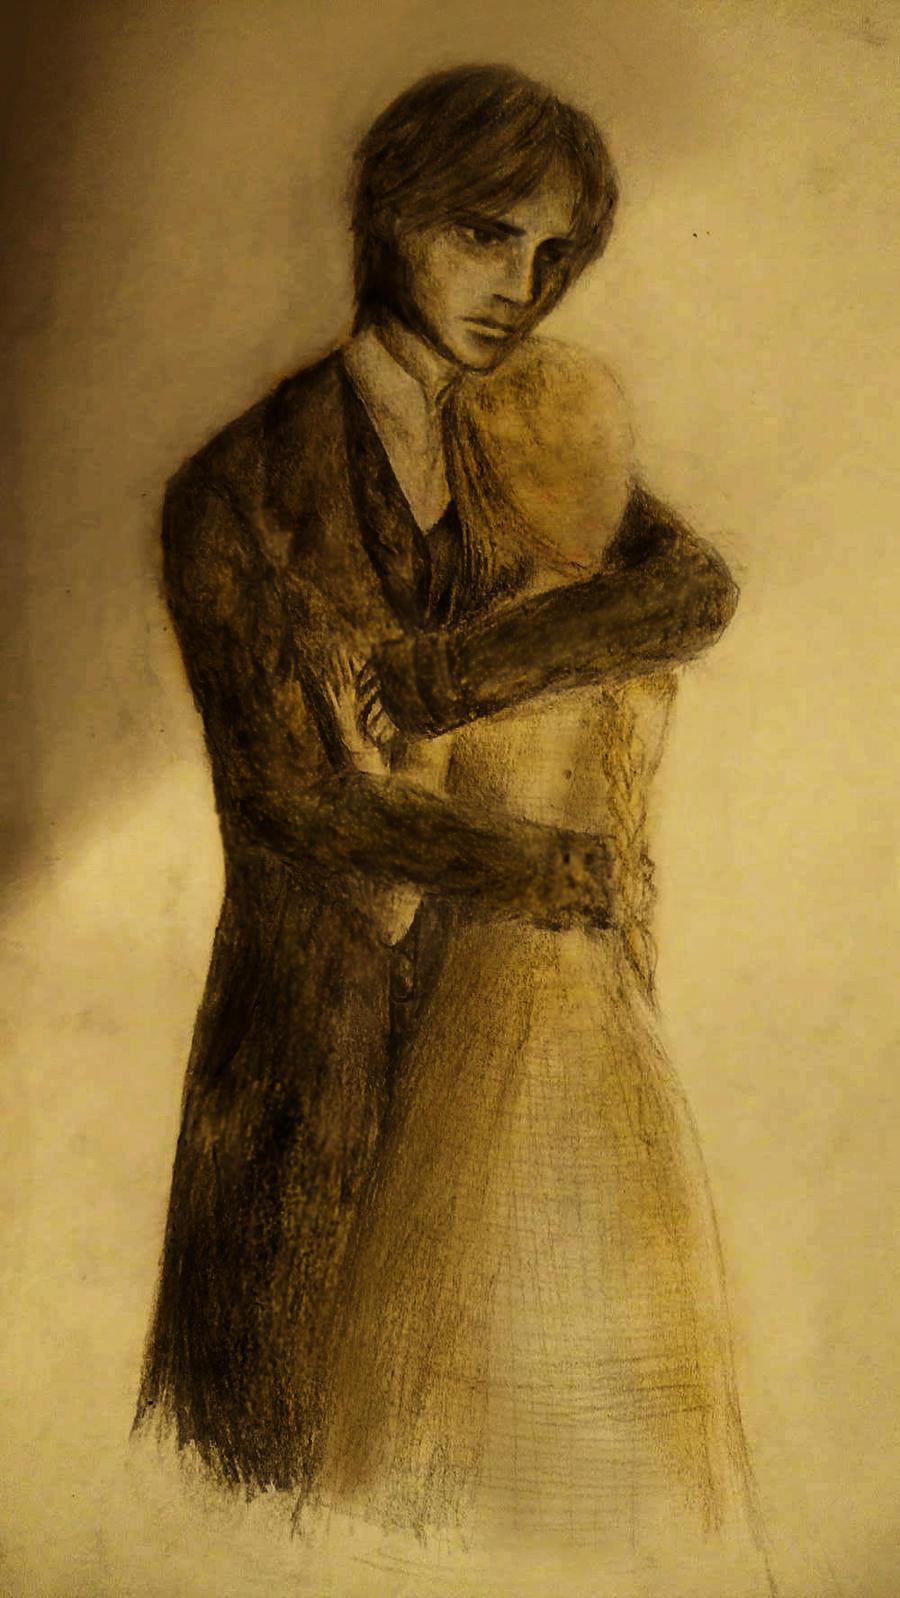 the character raskolnikov in crime and punishment by dostoevsky Based on fyodor dostoevsky's novel crime and punishment, this lesson plan  presents  the mystery revolves around the character of raskolnikov himself.